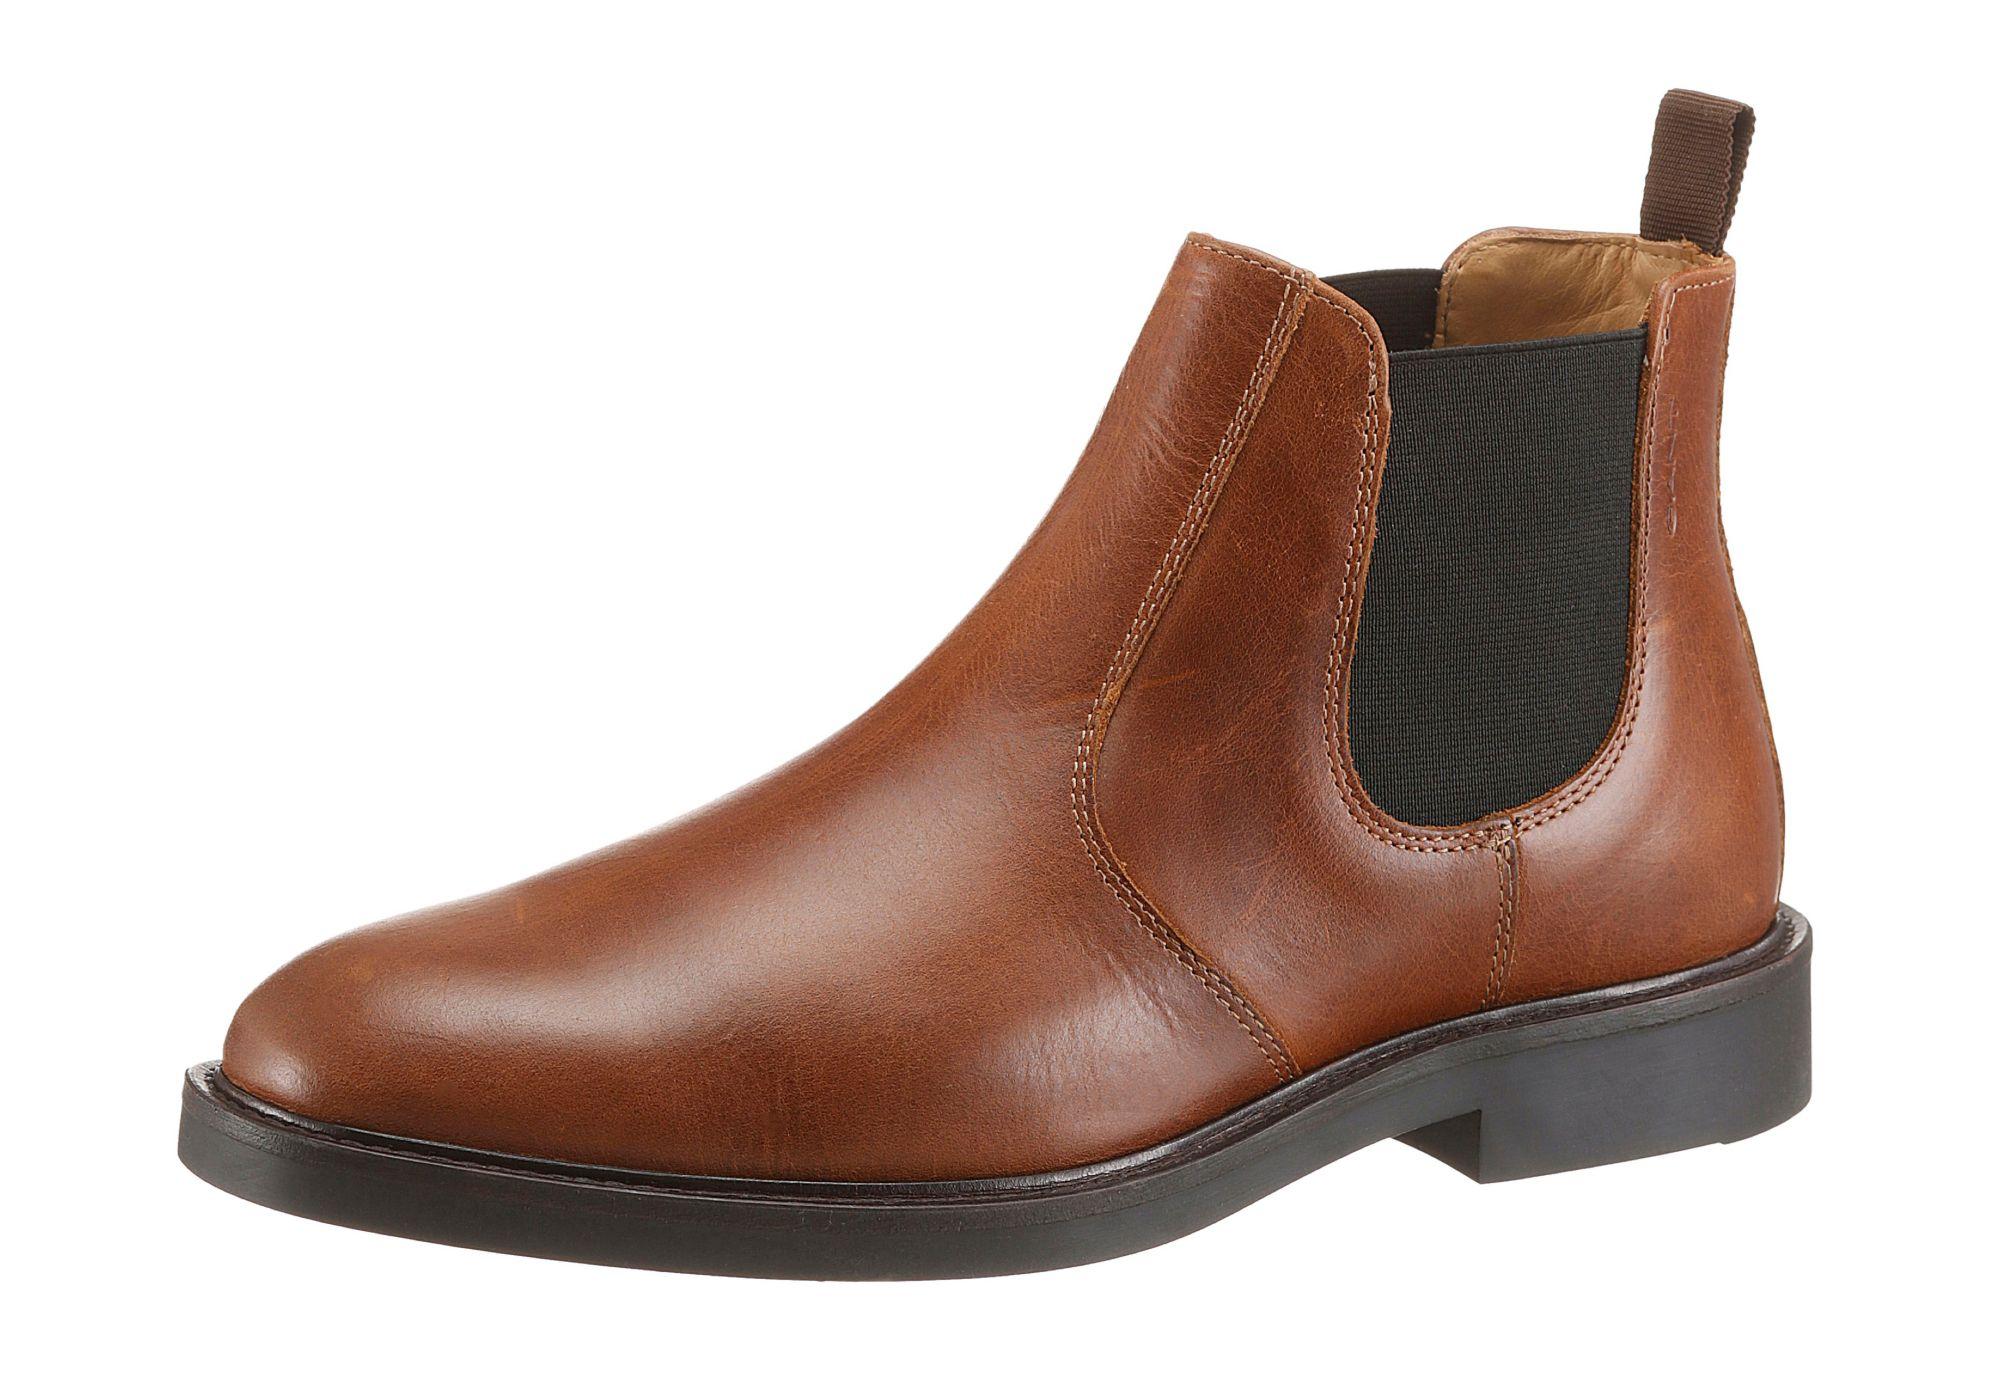 GANT FOOTWEAR Gant Footwear Chelseaboots »Spencer Chelsea«